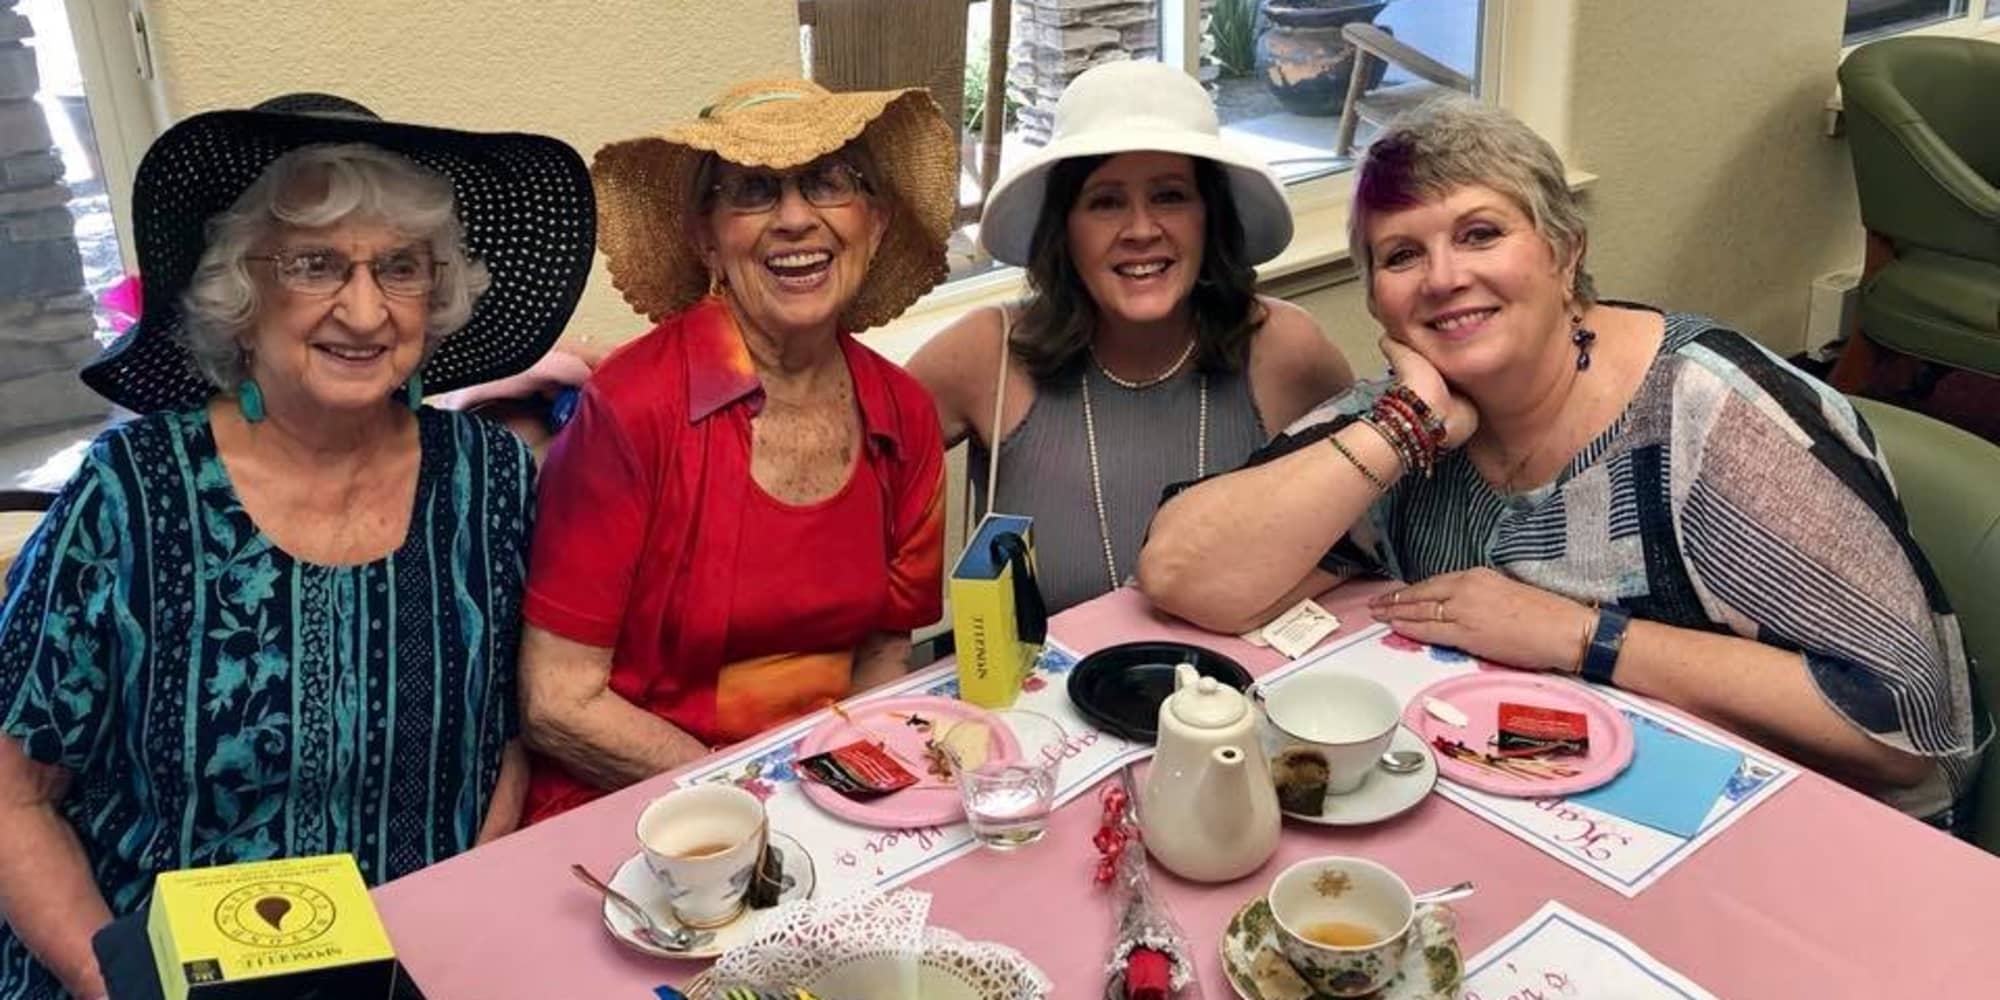 Residents having tea at Paloma Landing Retirement Community in Albuquerque, New Mexico